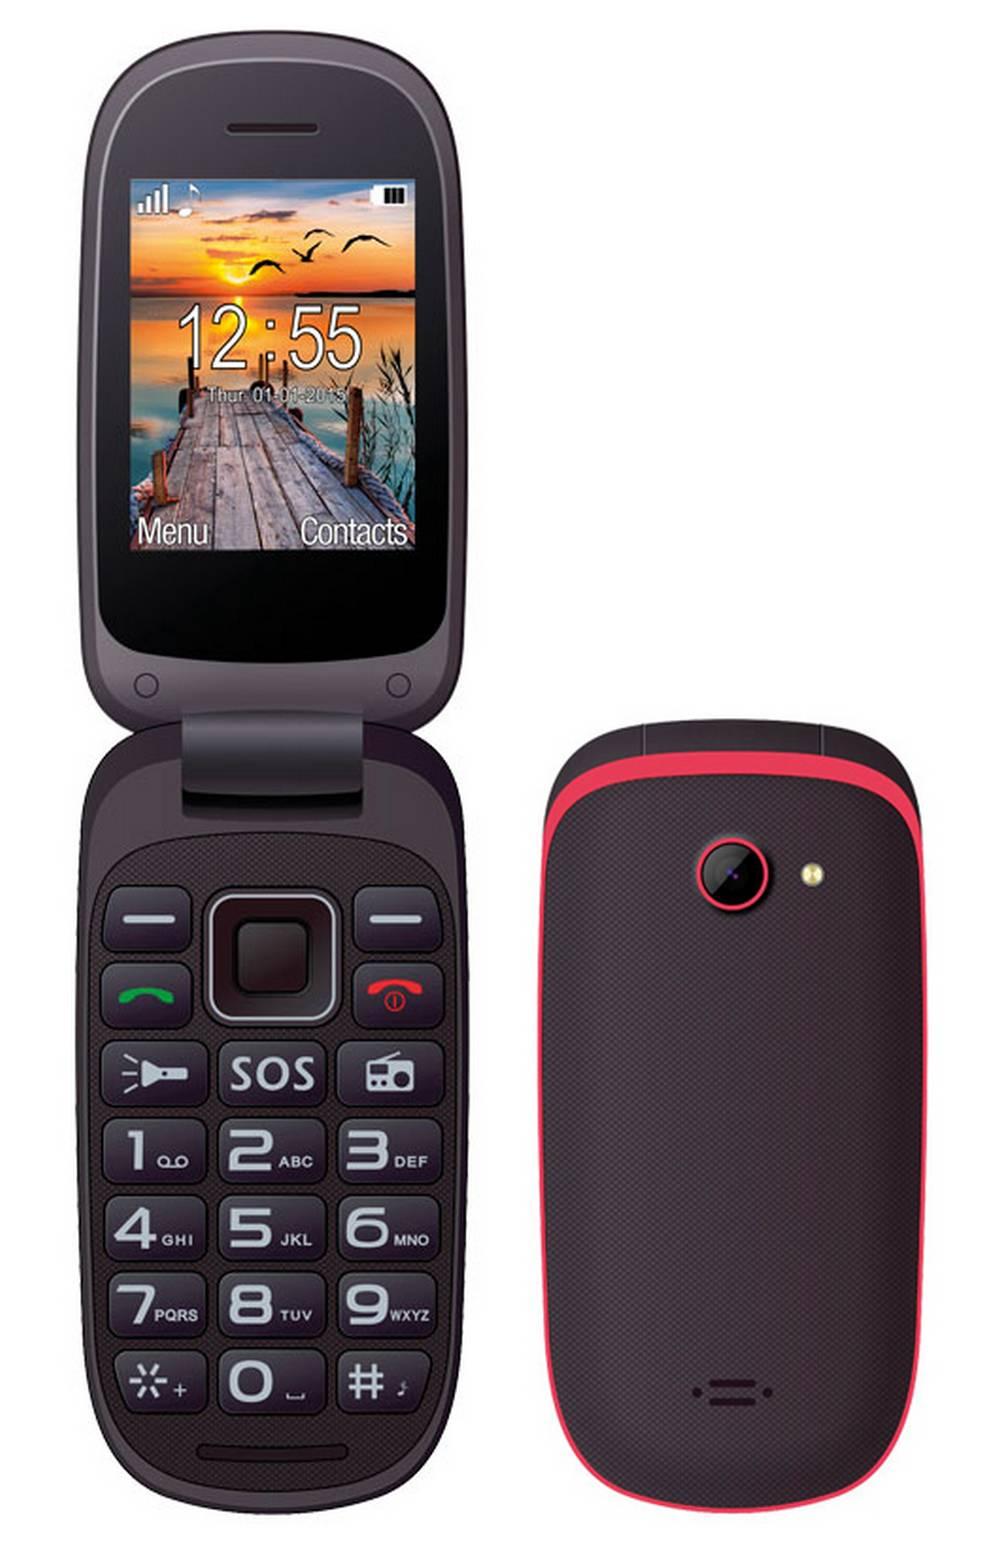 Maxcom MM818 (Dual Sim) με Μεγάλα Πλήκτρα, Ραδιόφωνο (Λειτουργεί χωρίς Handsfree) και Πλήκτρο Έκτακτης Ανάγκης Μαύρο-Κόκκινο